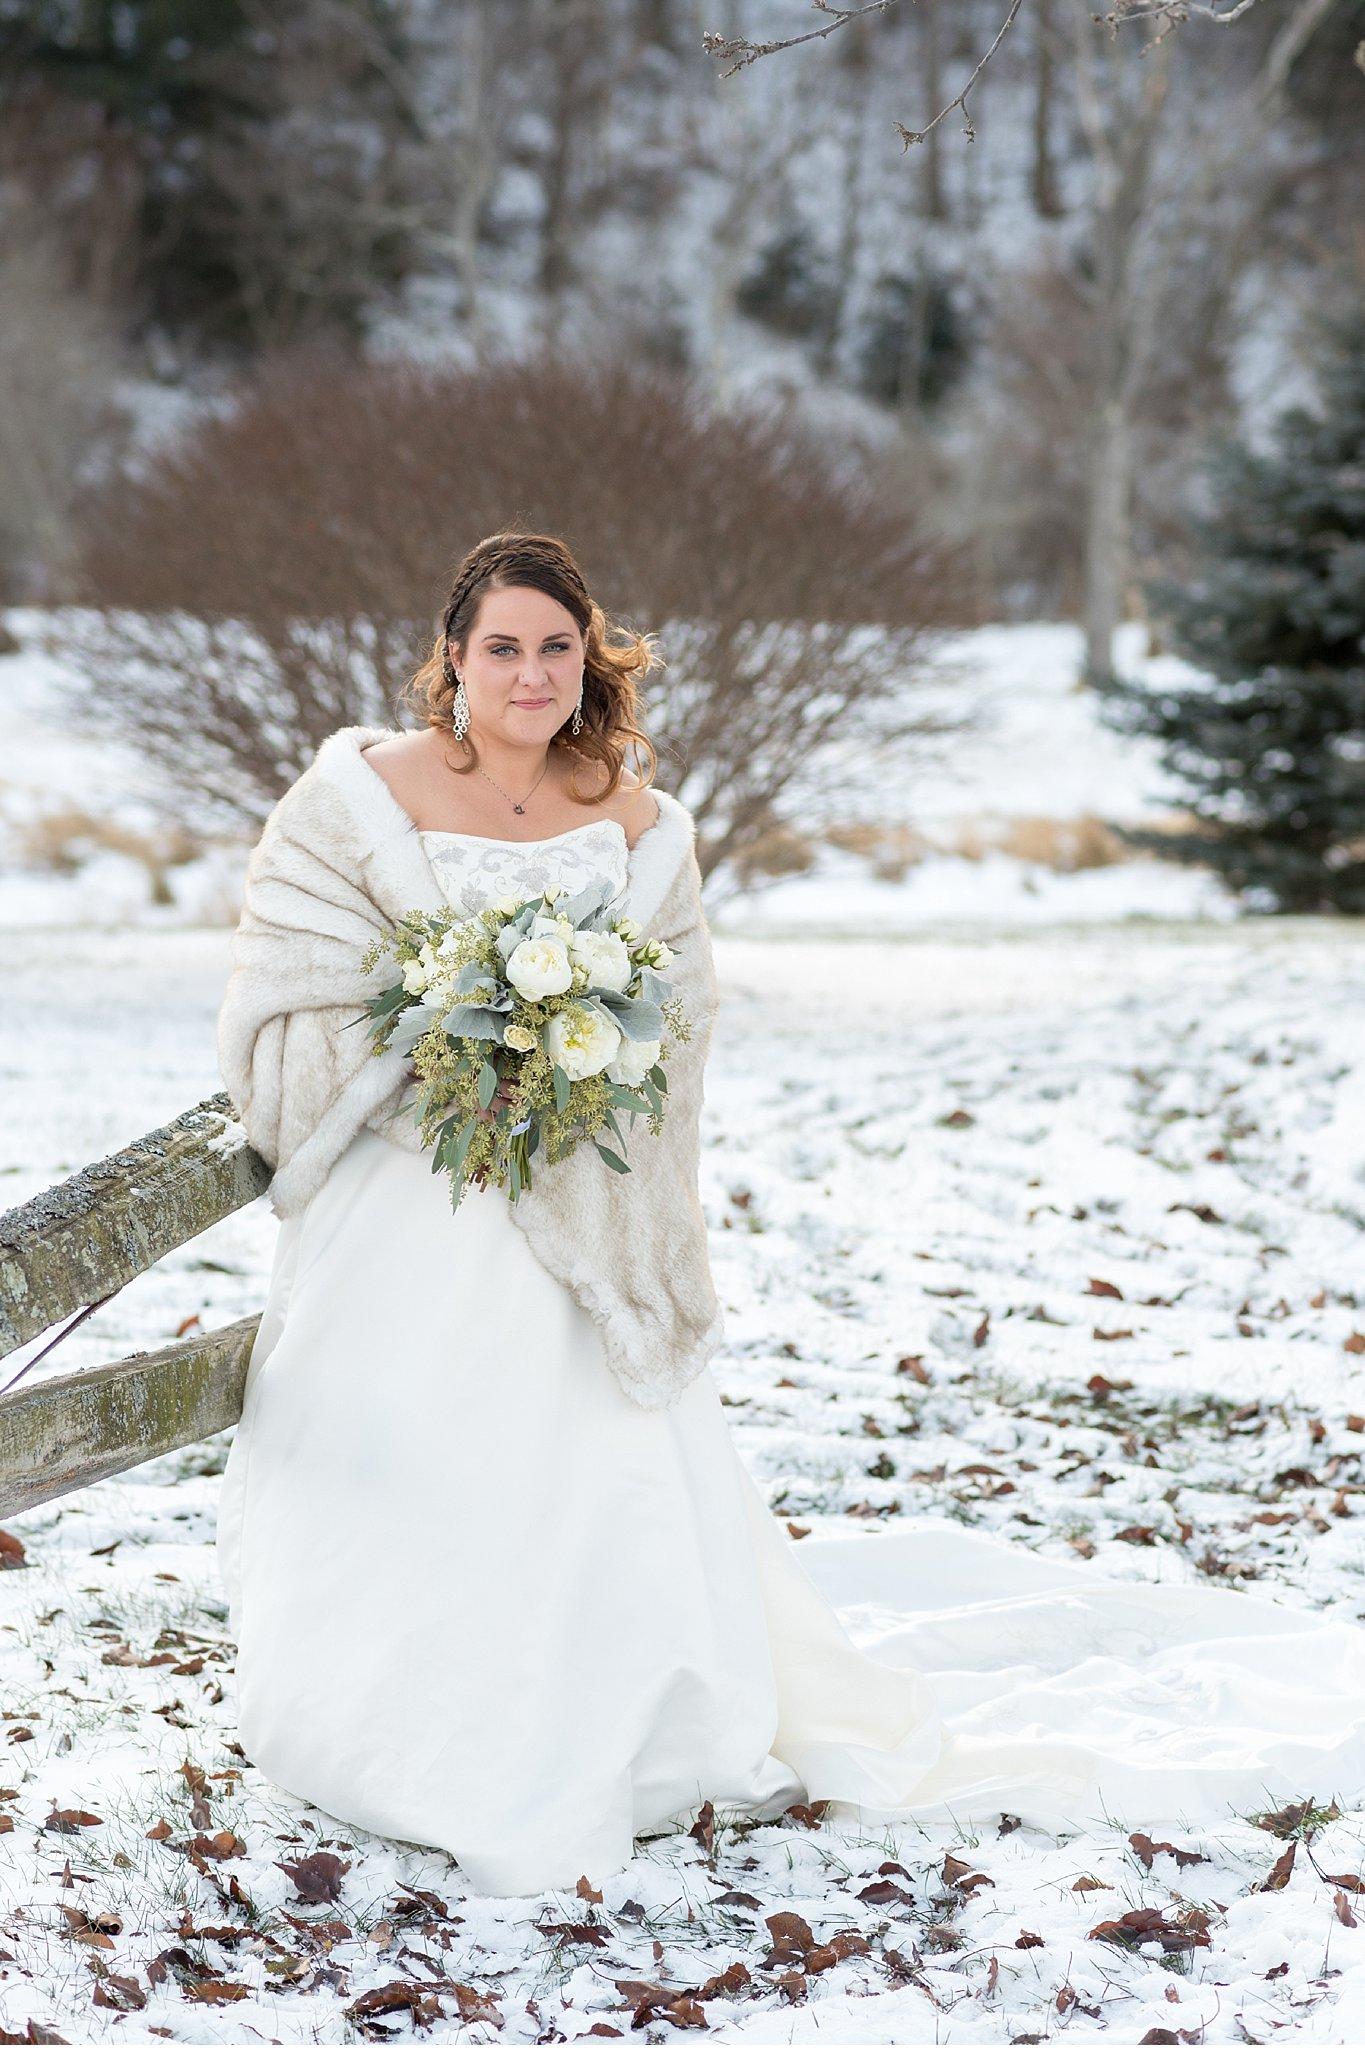 Winter elopemen snow covered vow exchange Coudersport PA photo_0575.jpg